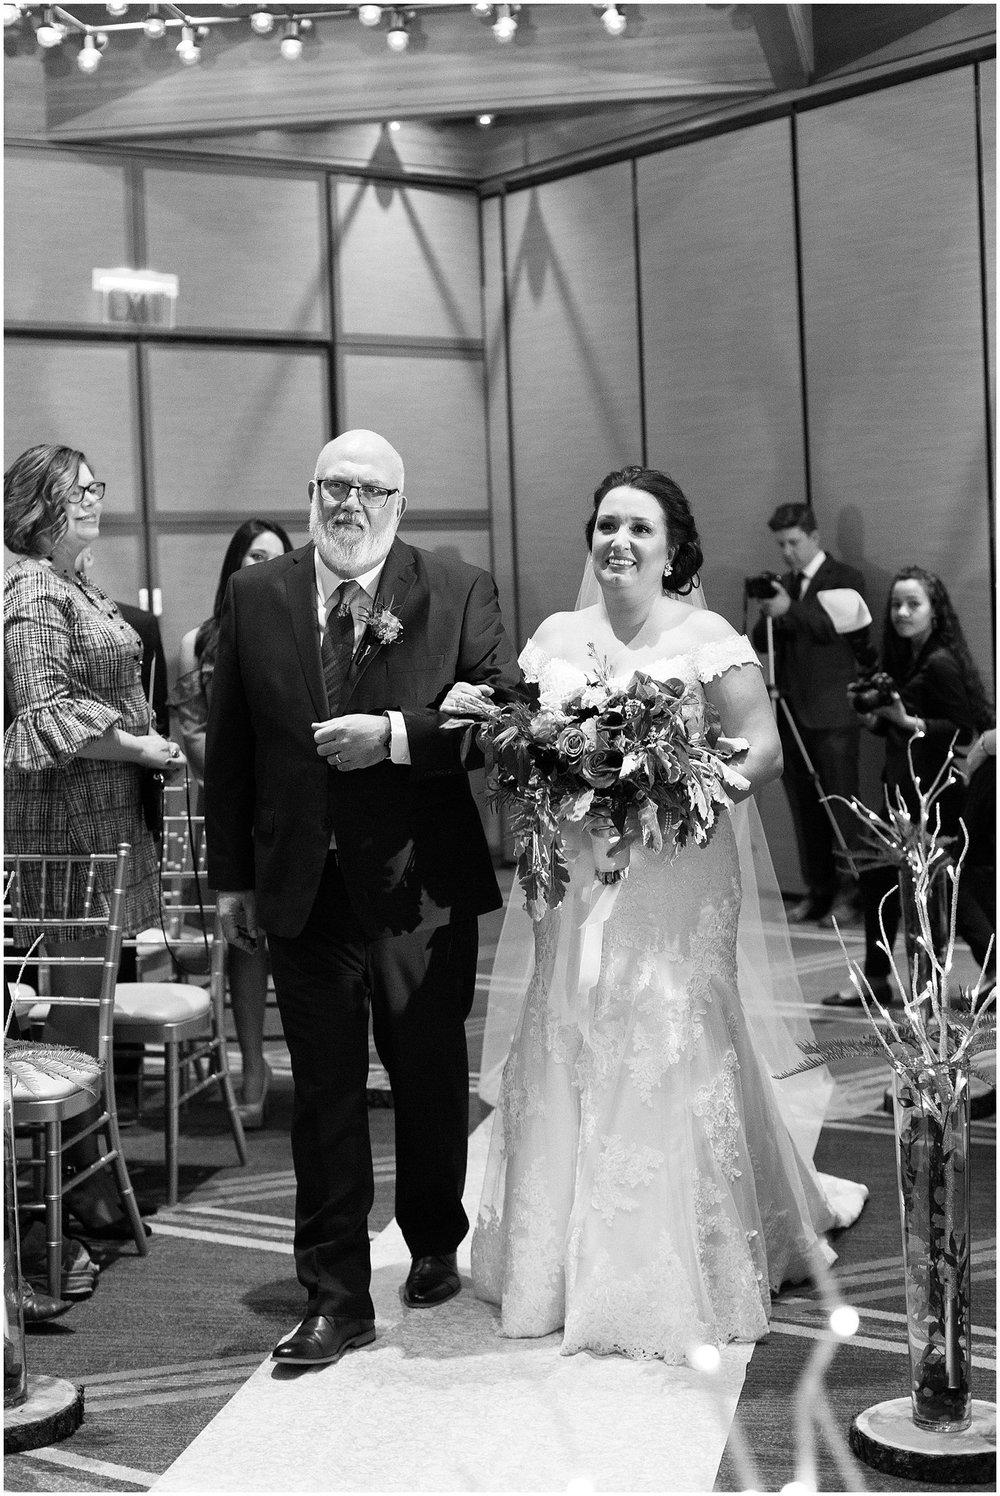 Hyatt-Lodge-Mcdonald-Campus-Wedding_0052.jpg